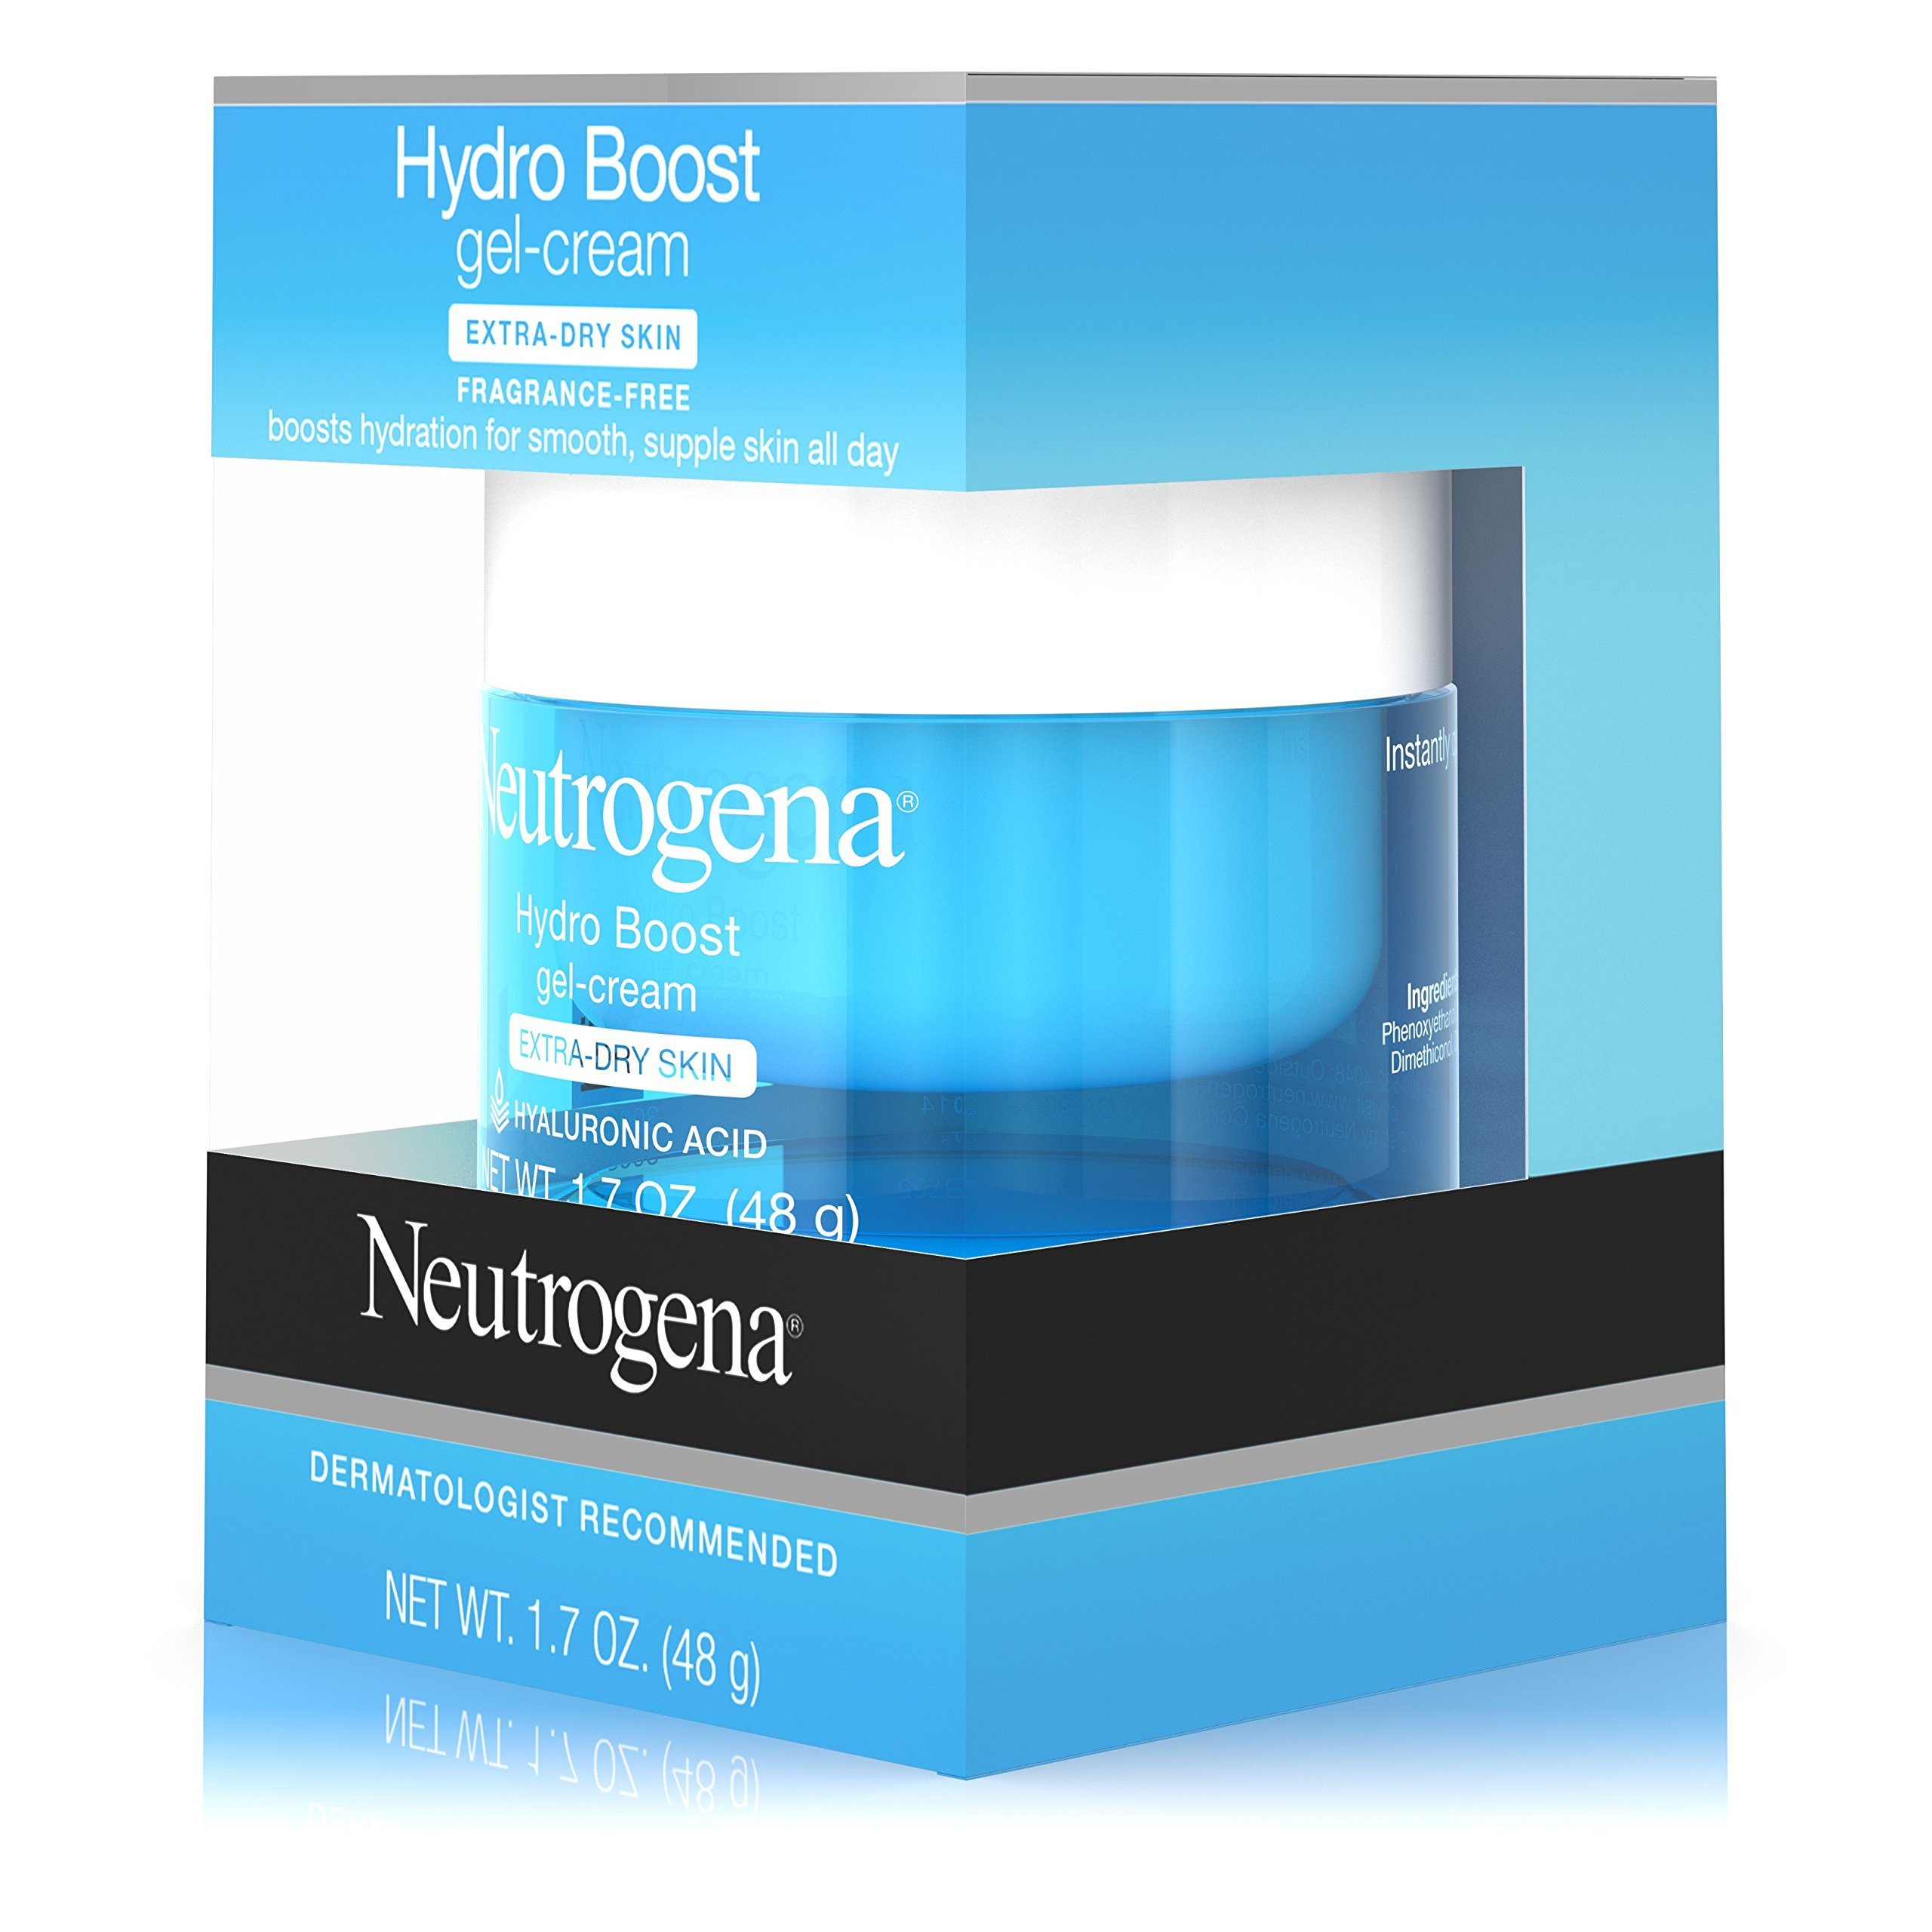 Neutrogena Hydro Boost Hyaluronic Acid Hydrating Face Moisturizer Gel-Cream to Hydrate and Smooth Extra-Dry Skin, 1.7 oz by Neutrogena (Image #12)